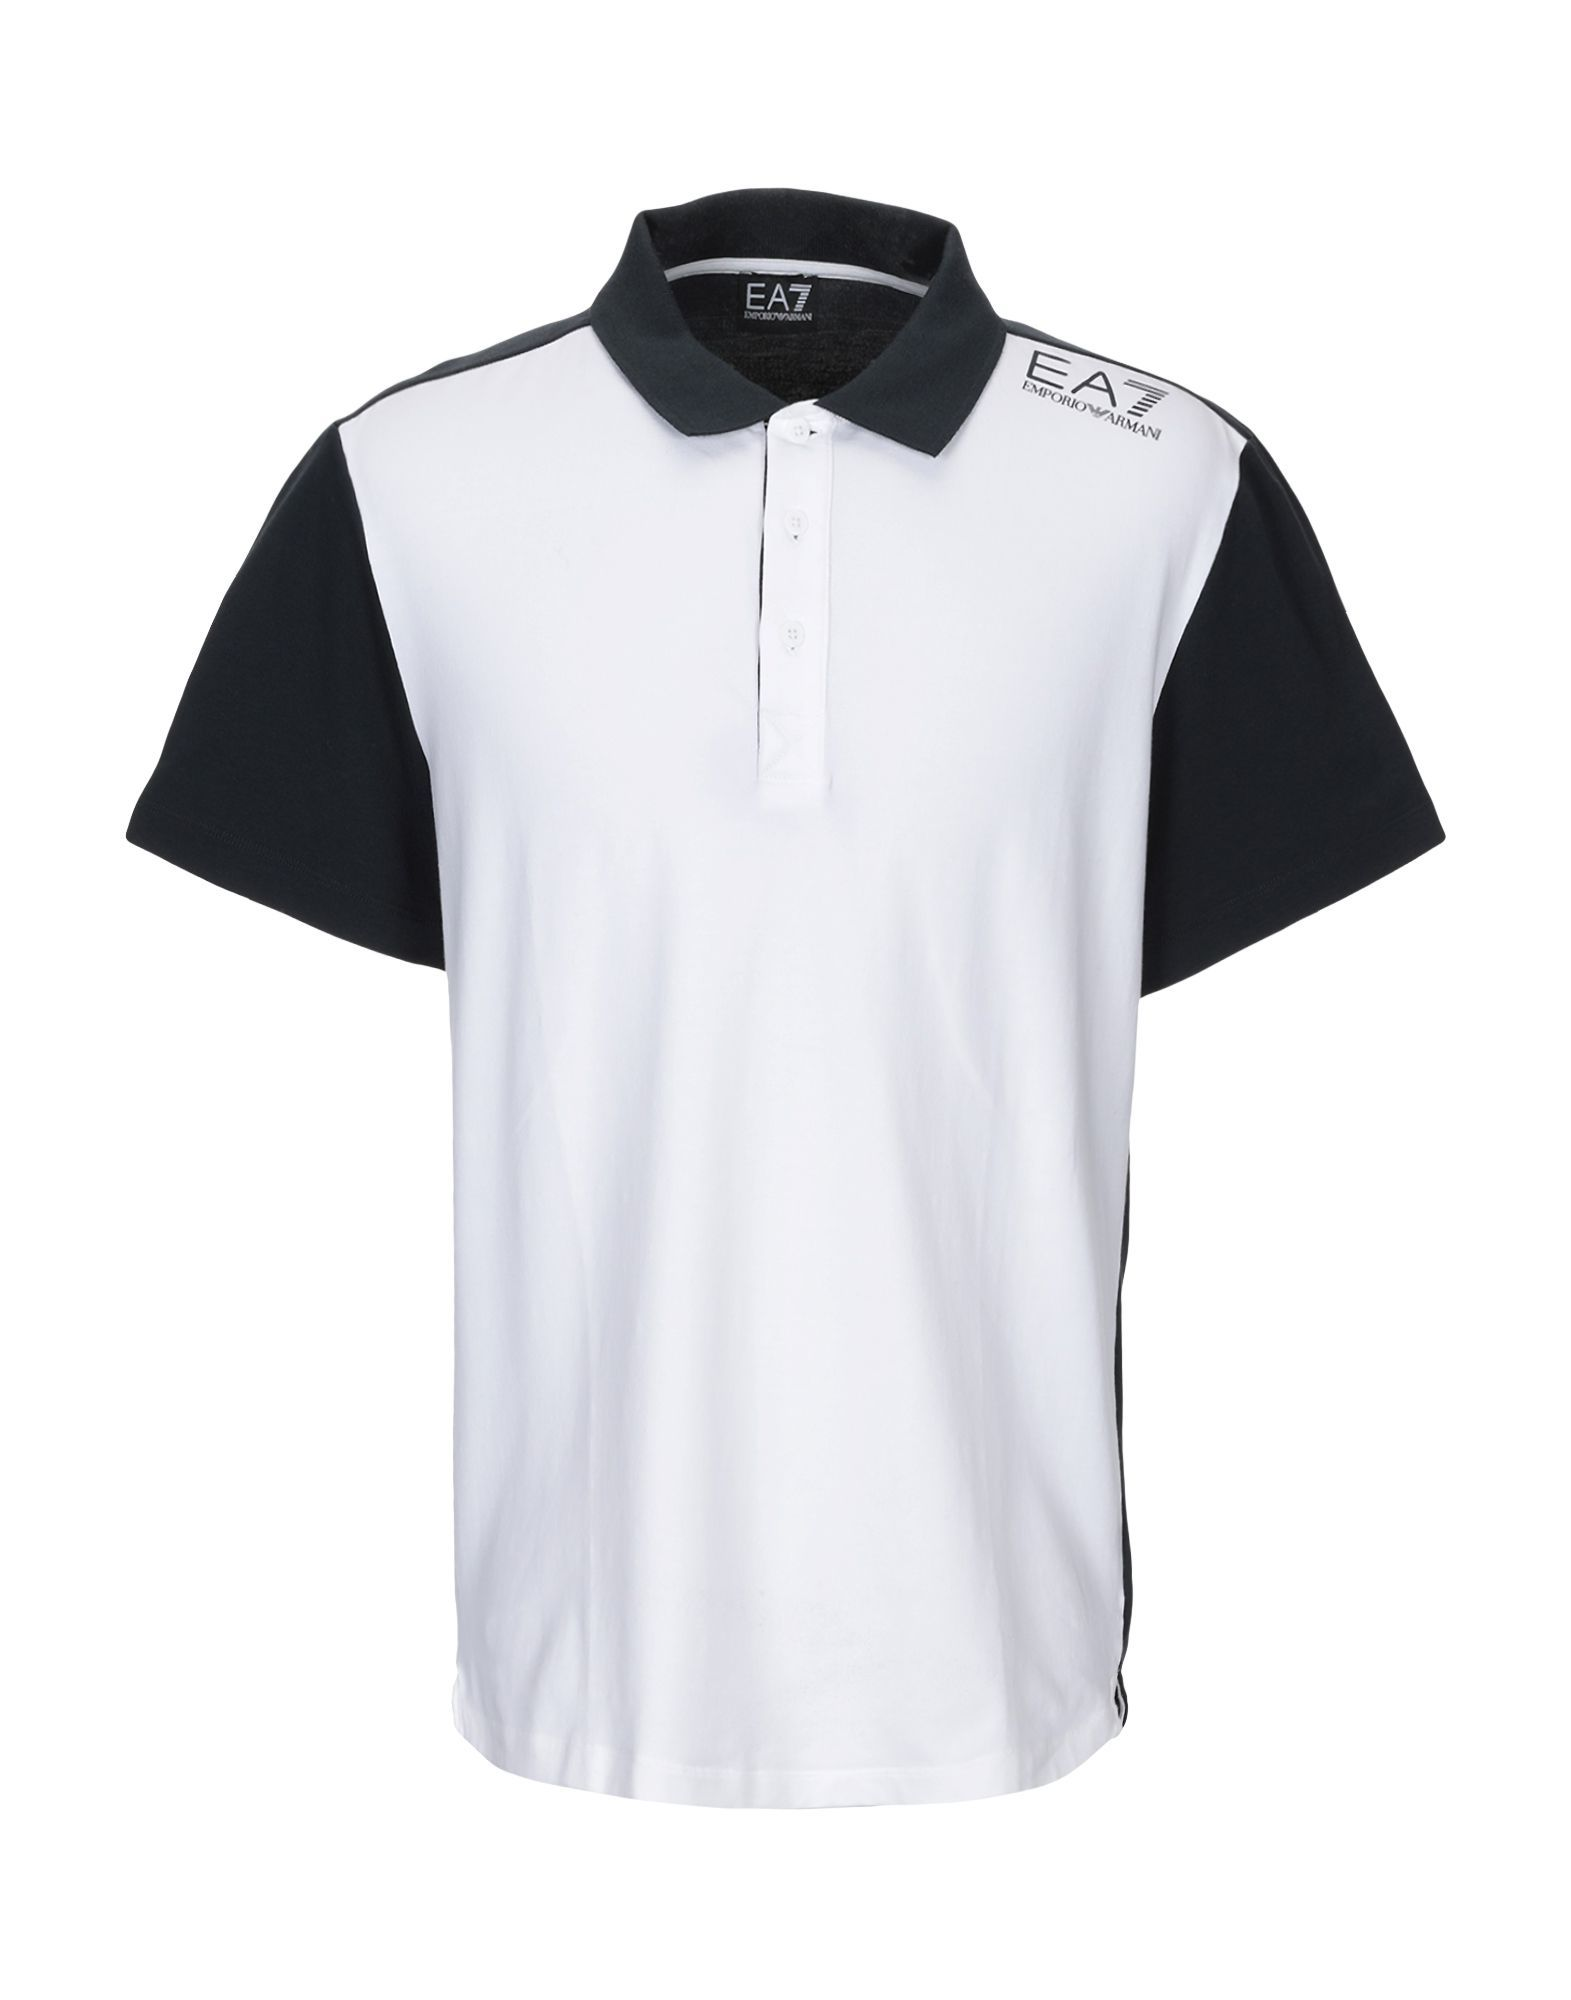 dc7e7009 EA7 POLO SHIRTS. #ea7 #cloth   Ea7 in 2019   Polo Shirt, Polo shirt ...